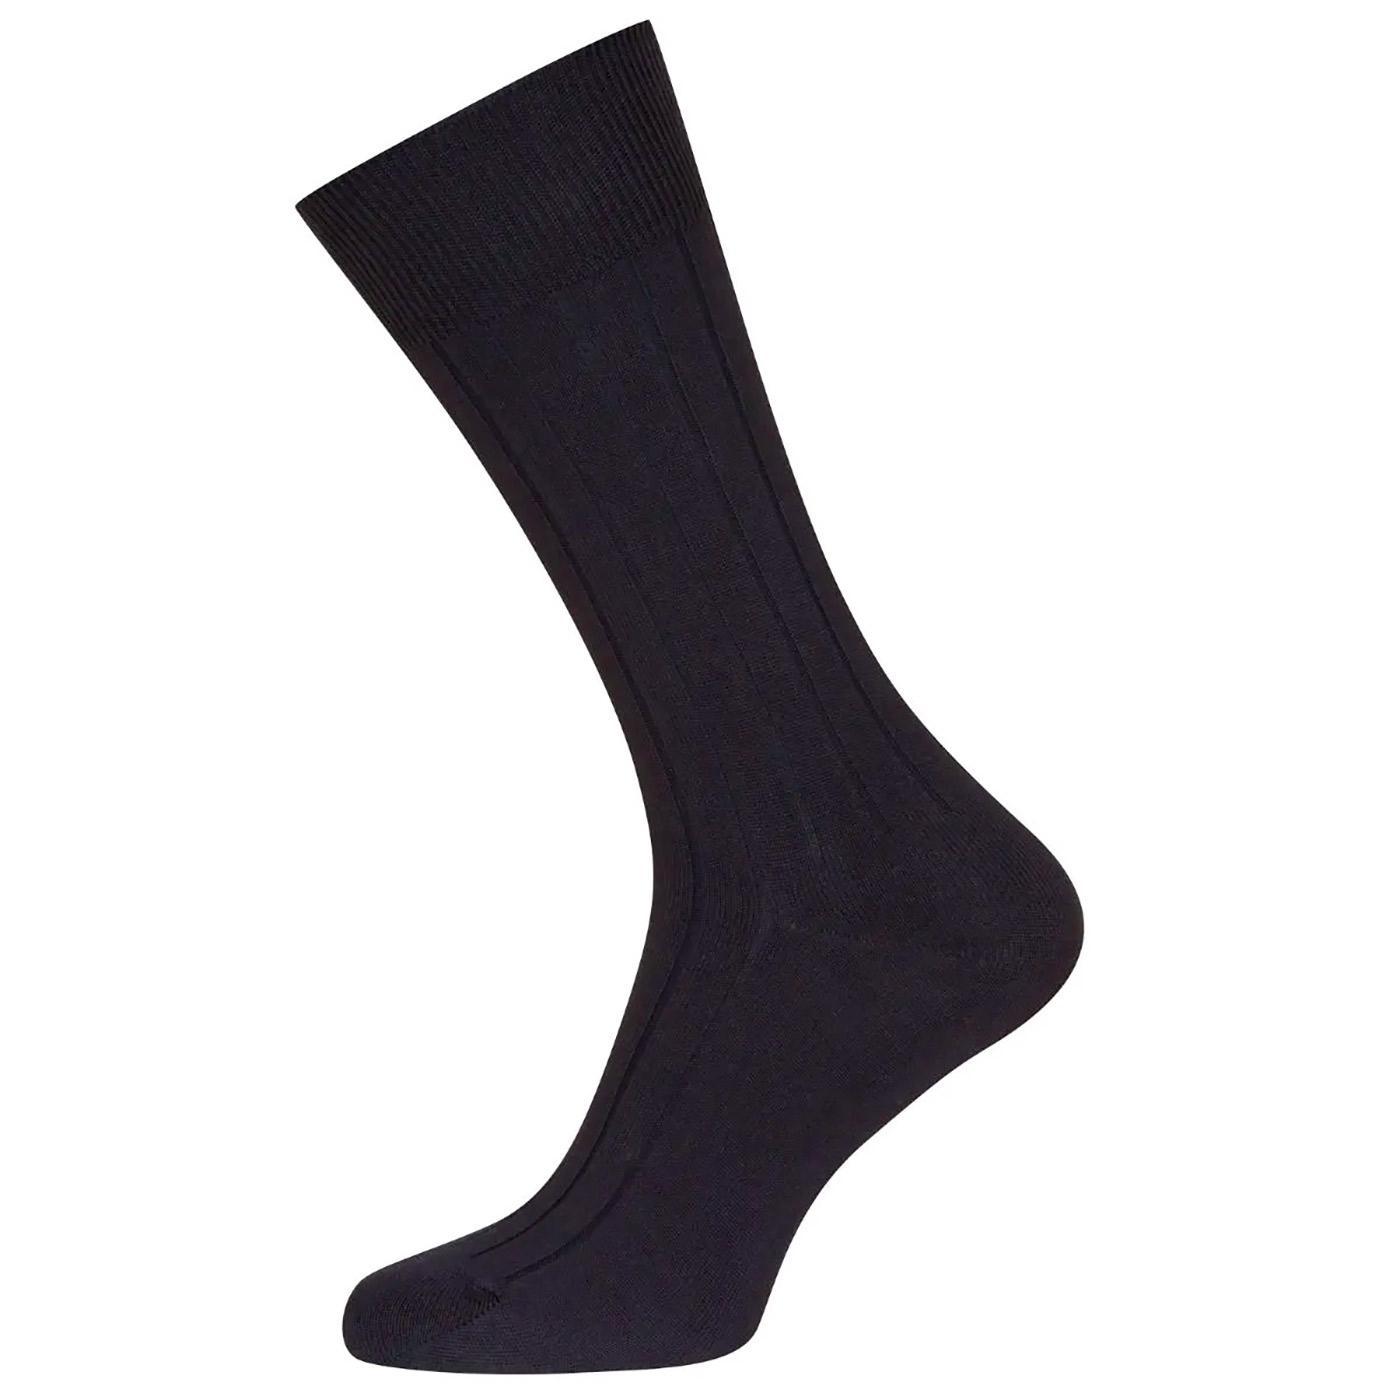 Delta JOHN SMEDLEY Mens Retro Ribbed Socks (Black)